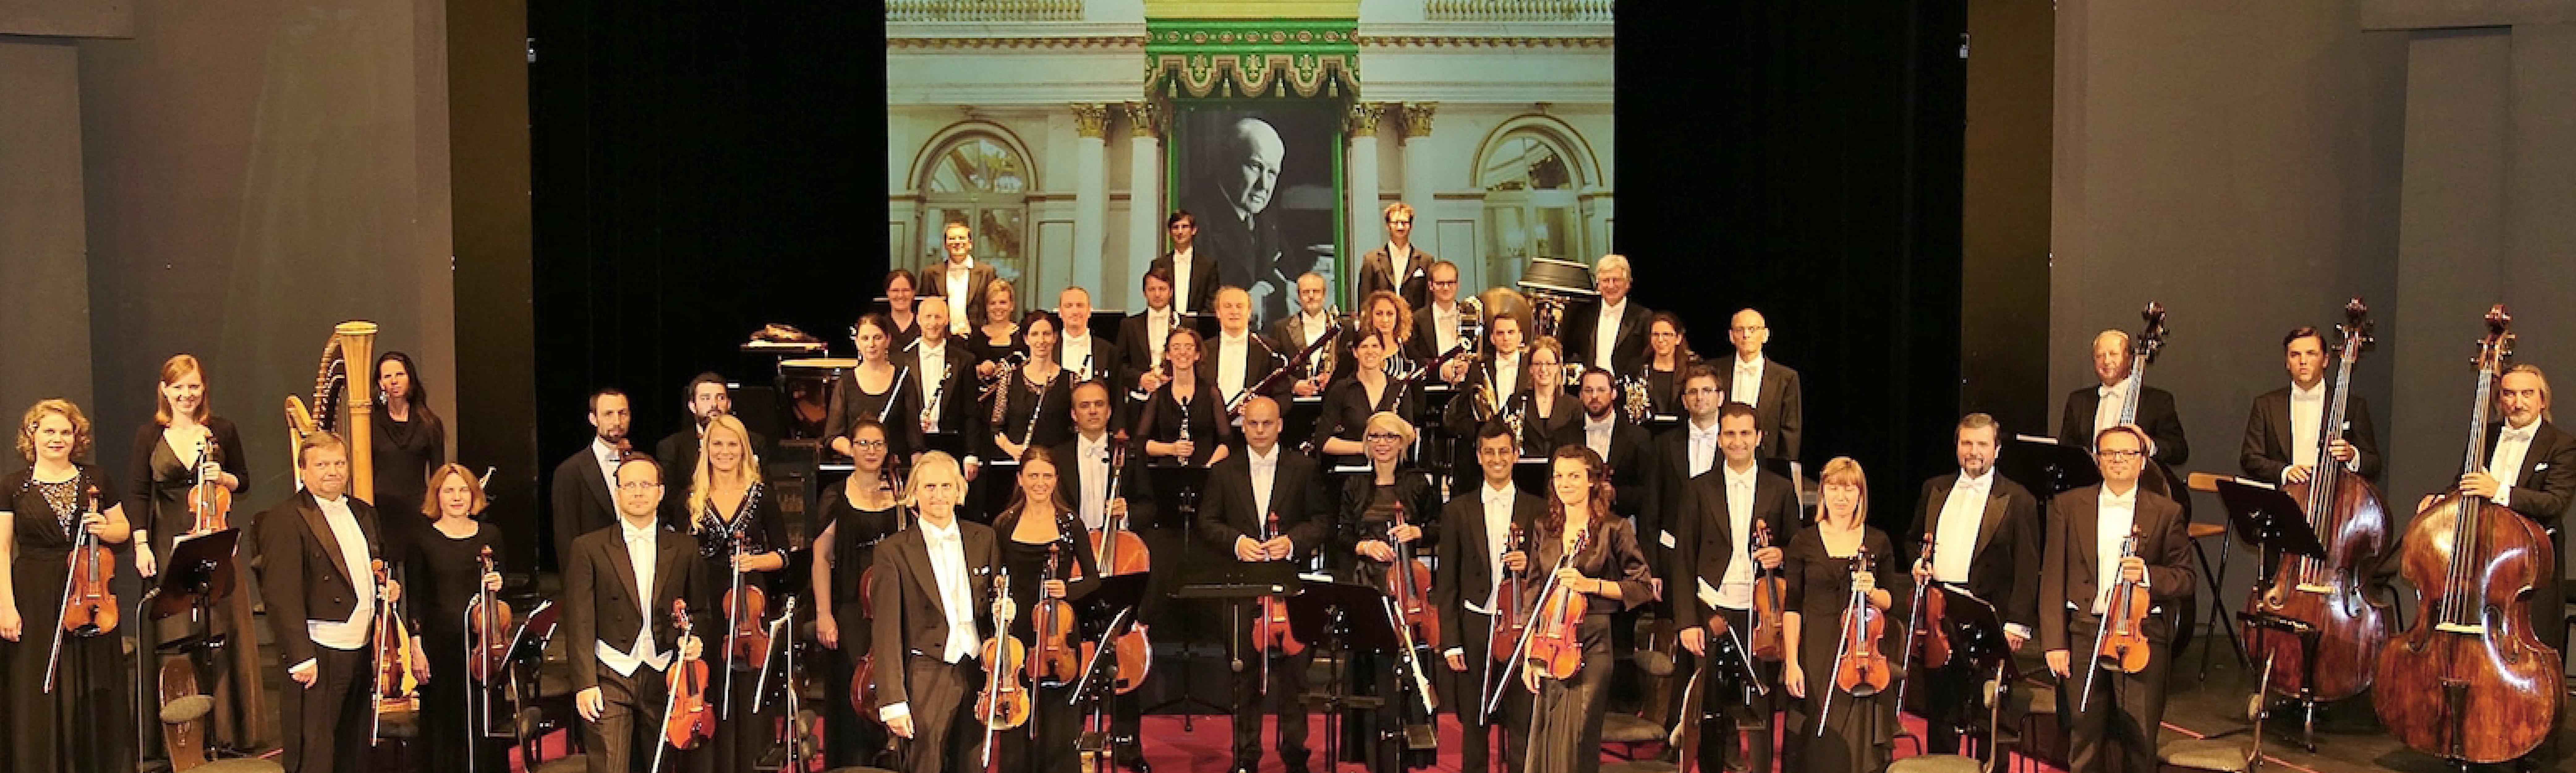 Das Franz Lehár-Orchester